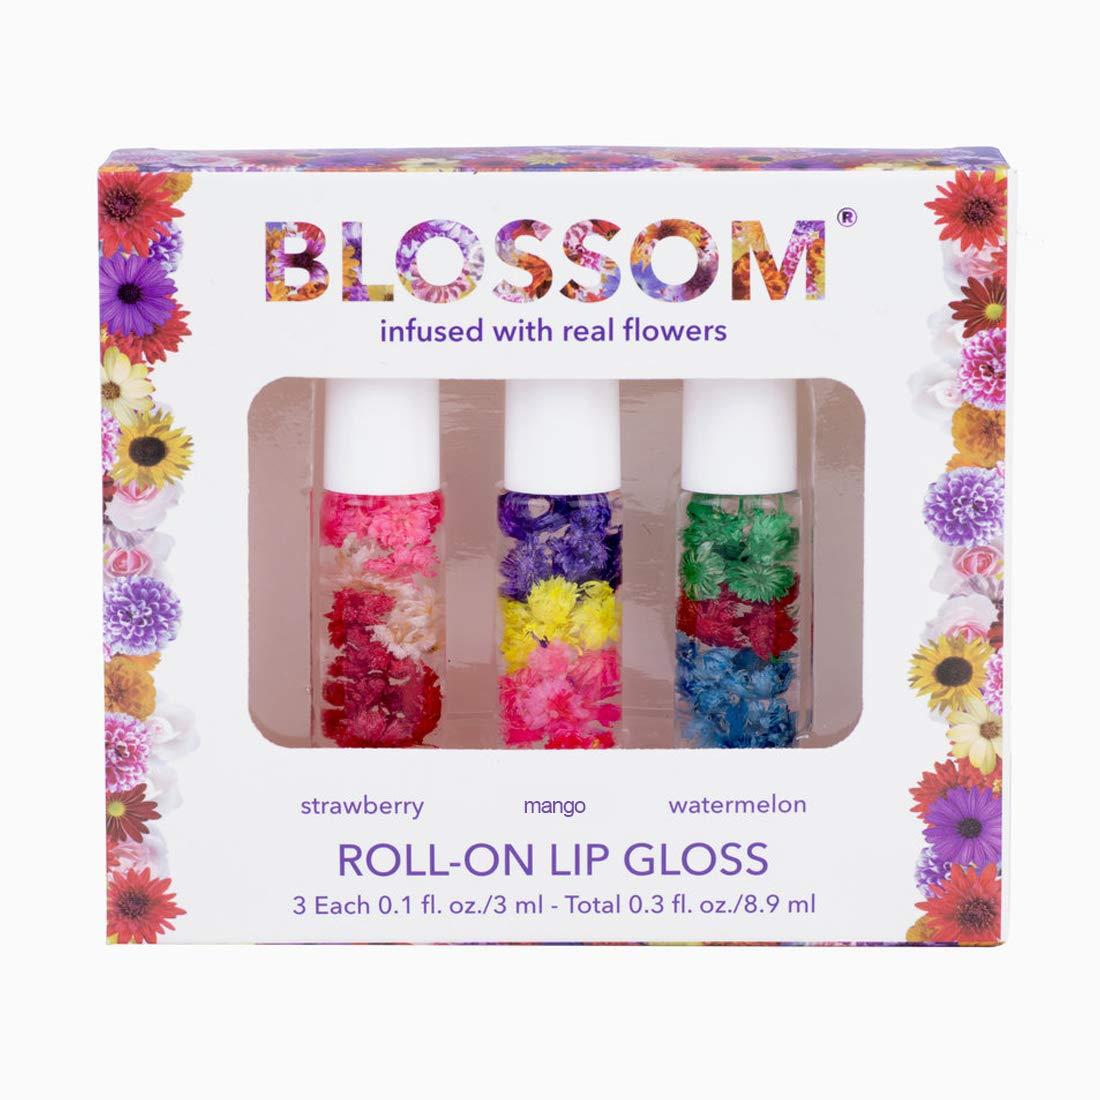 Blossom Roll-On LIP GLOSS Set Strawberry/Mango/Watermelon by Blossom